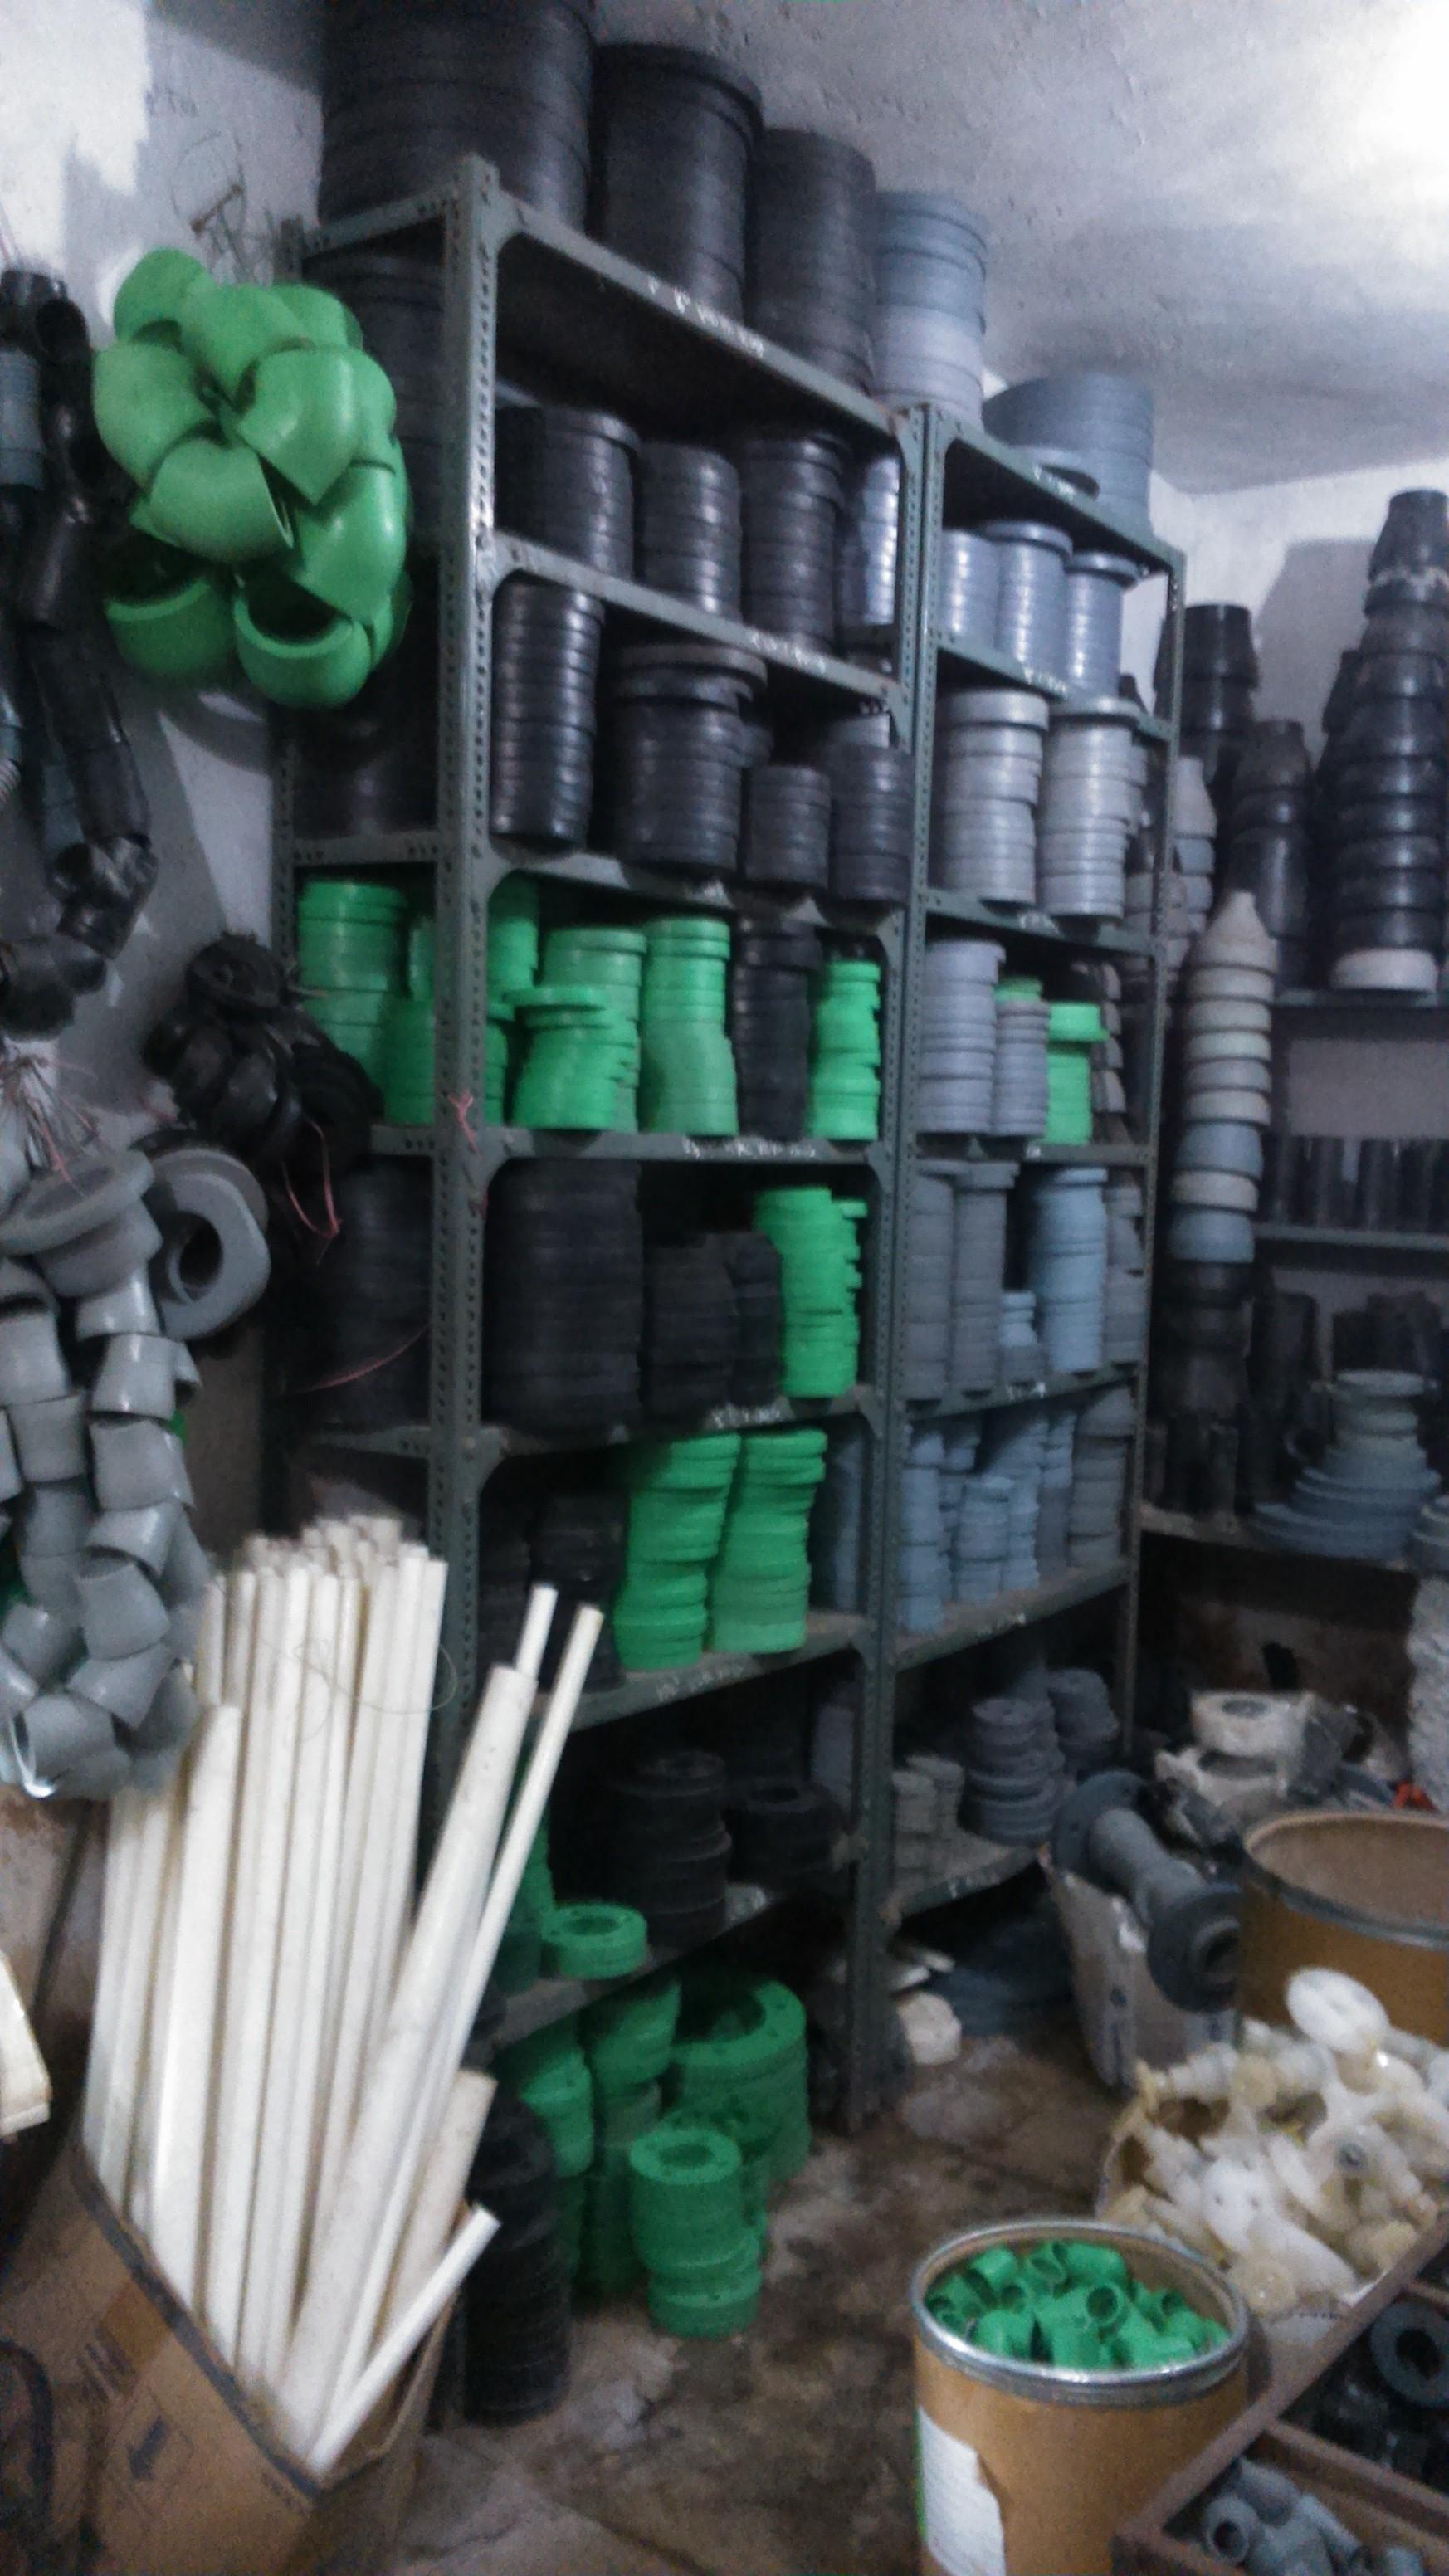 HDPE/PP/PPRC/UPVC/PVDF PIPES & Fitting